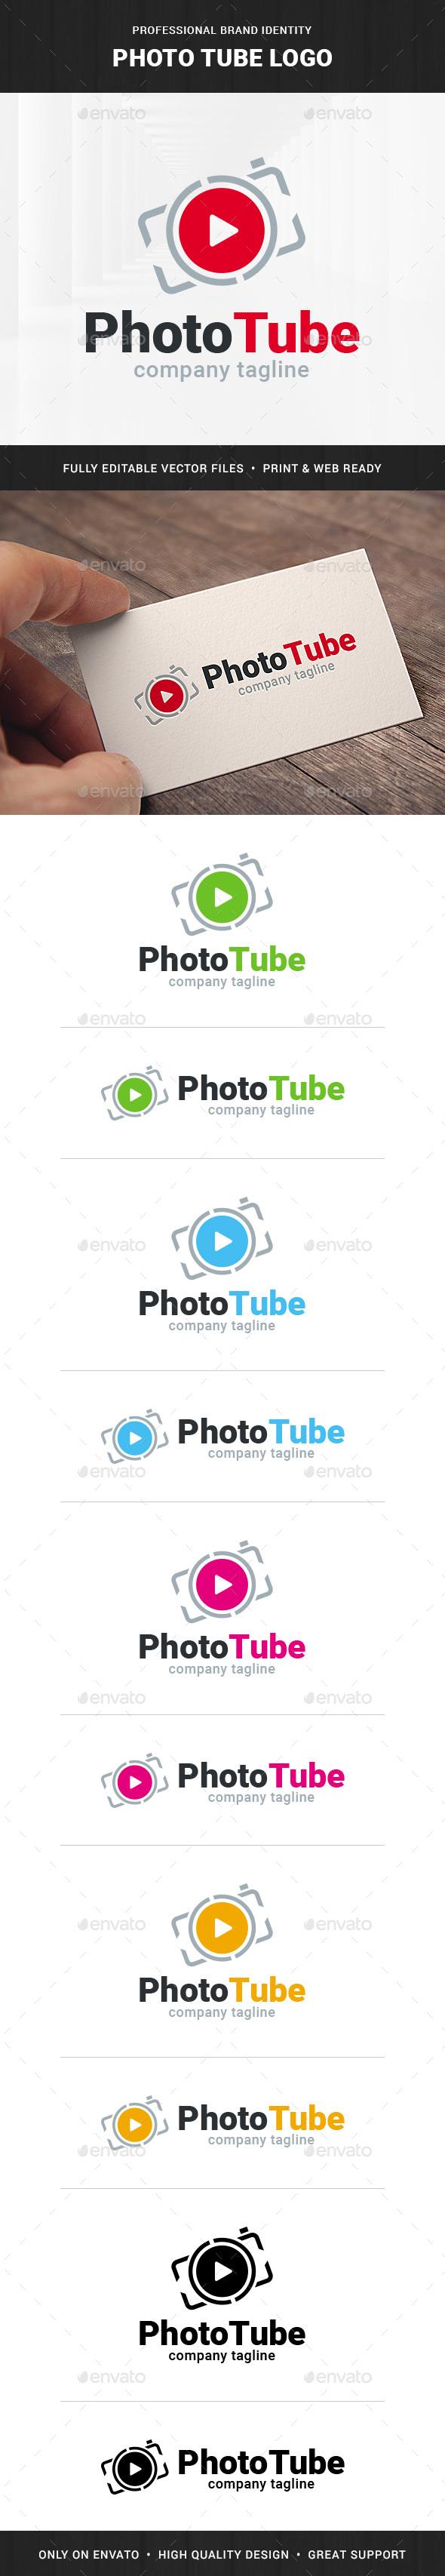 Photo Tube Logo Template